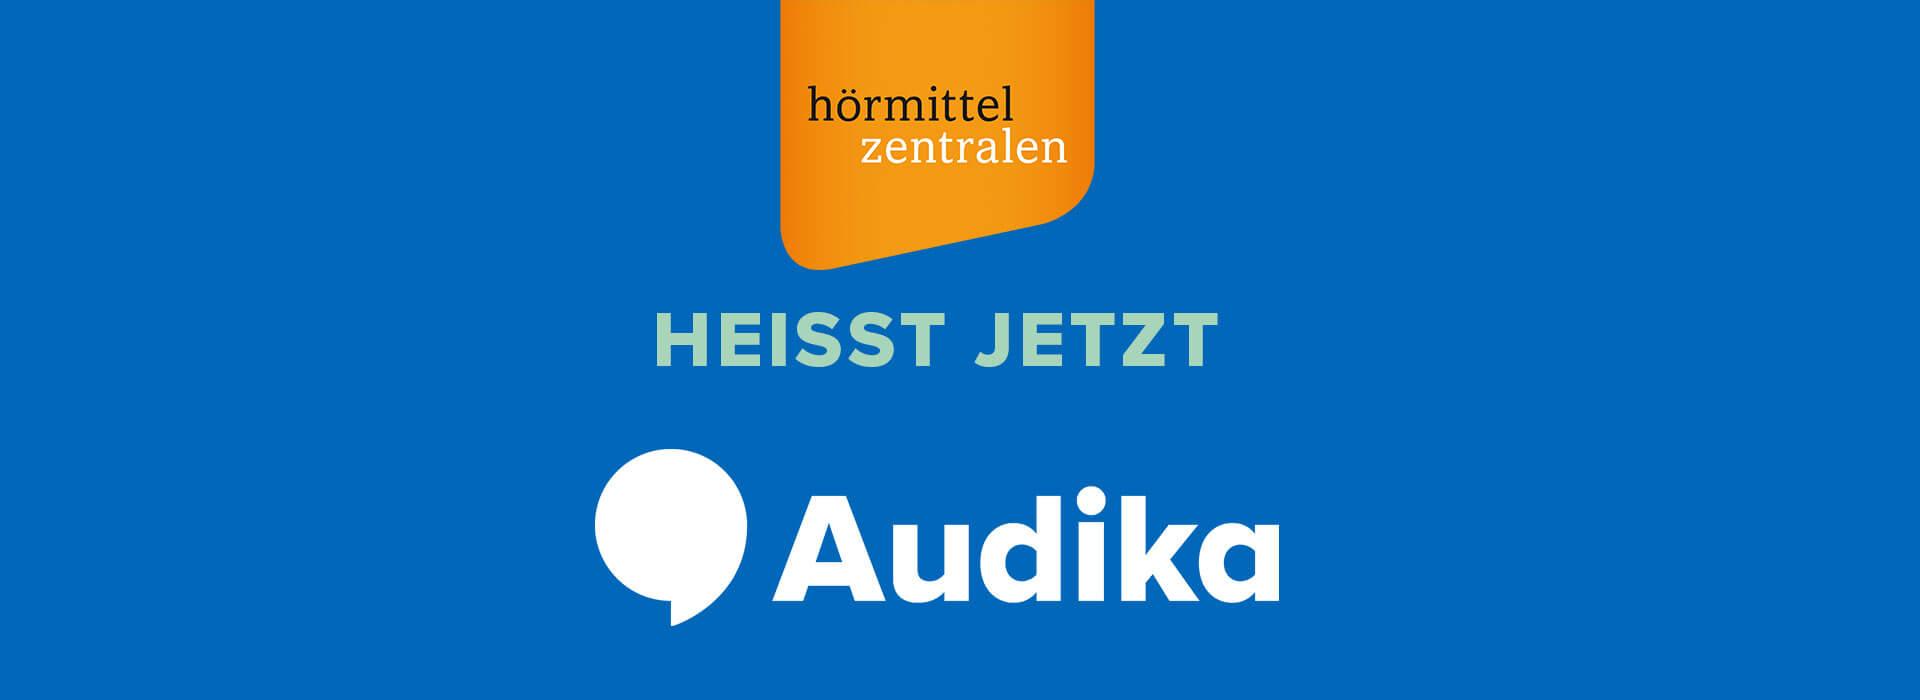 Hörmittelzentralen heissen jetzt Audika